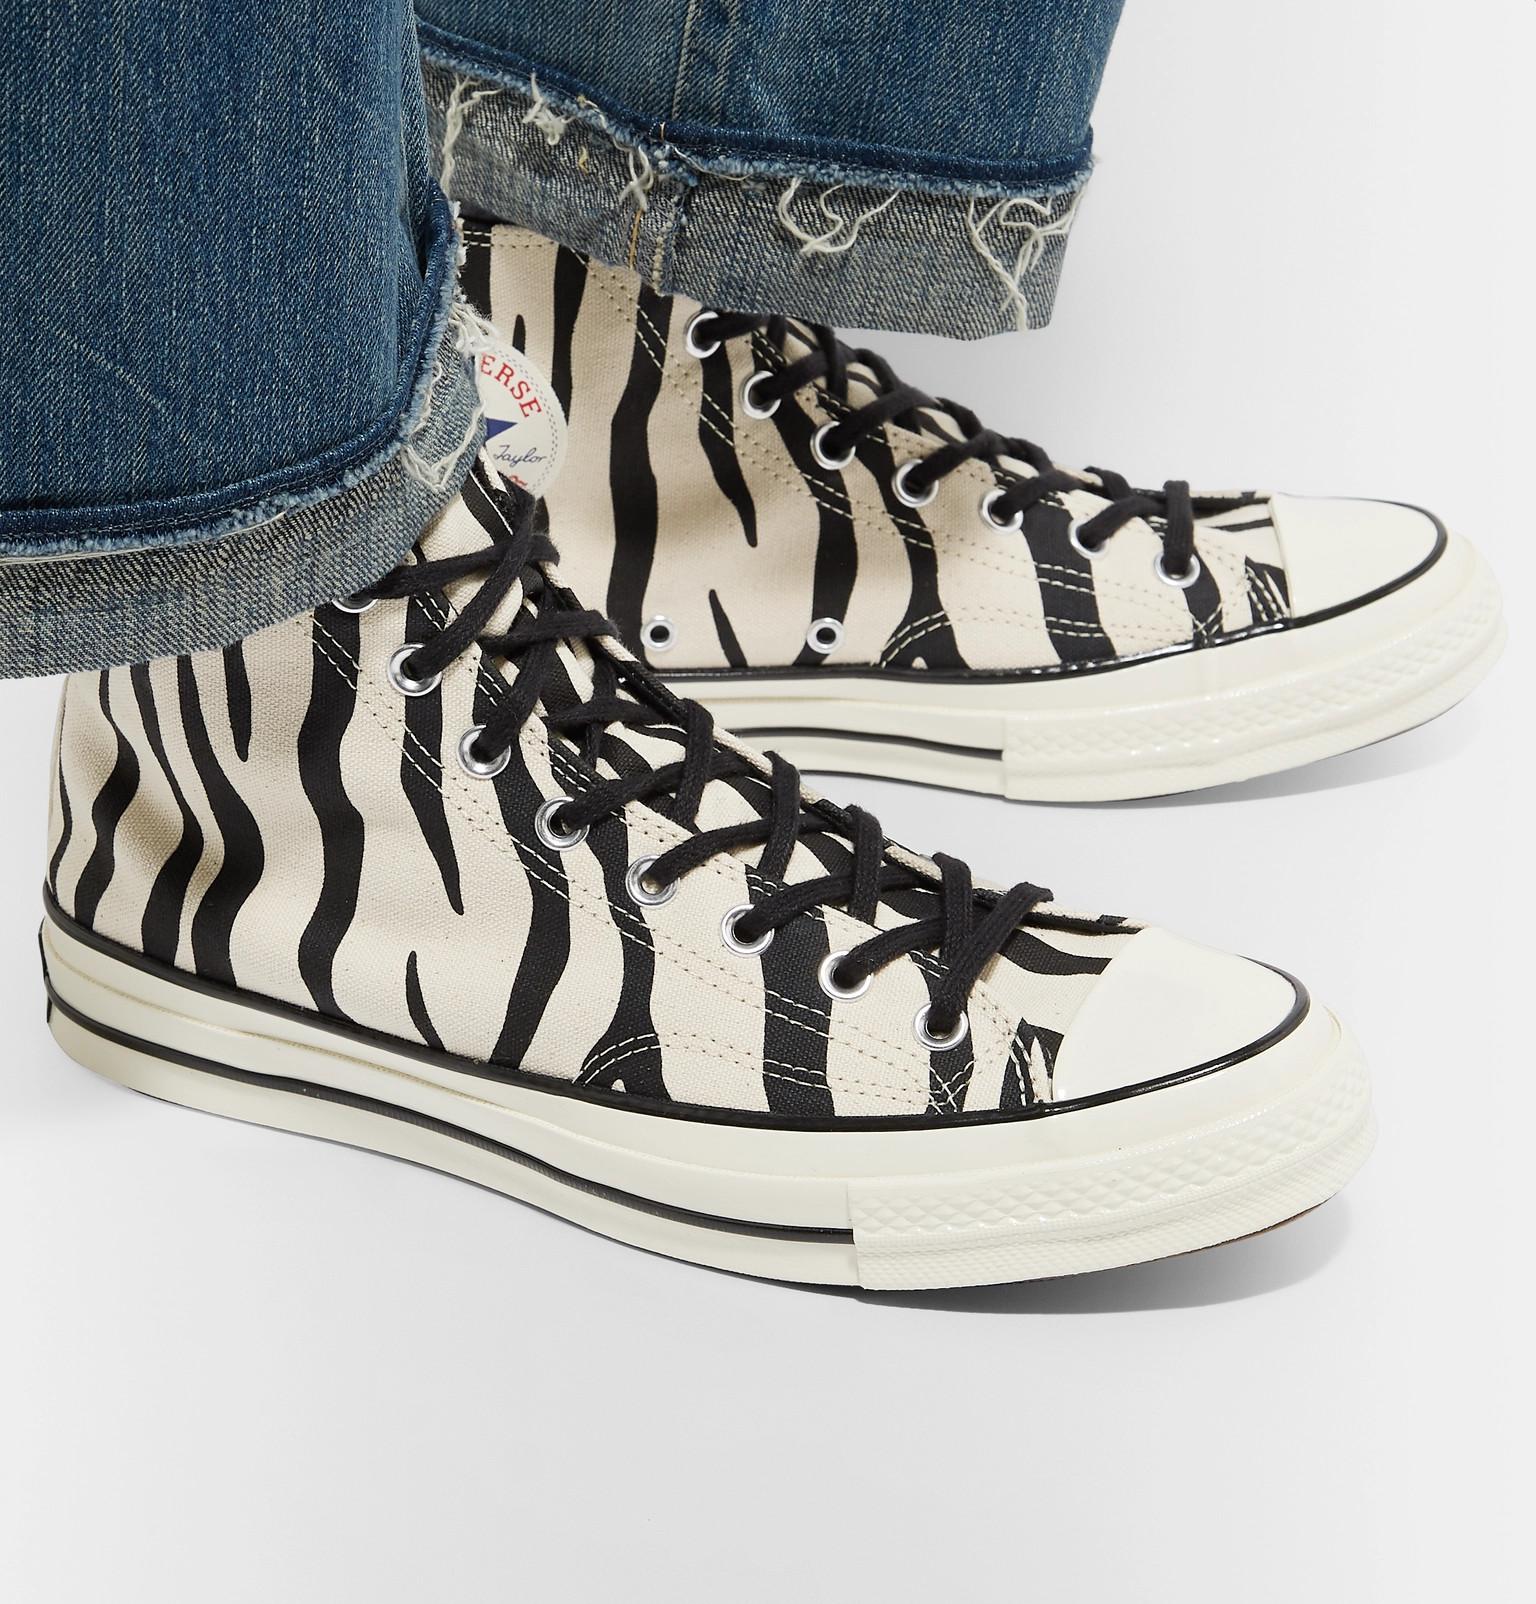 050e64a6889c Converse1970s Chuck Taylor All Star Zebra-Print Canvas High-Top Sneakers